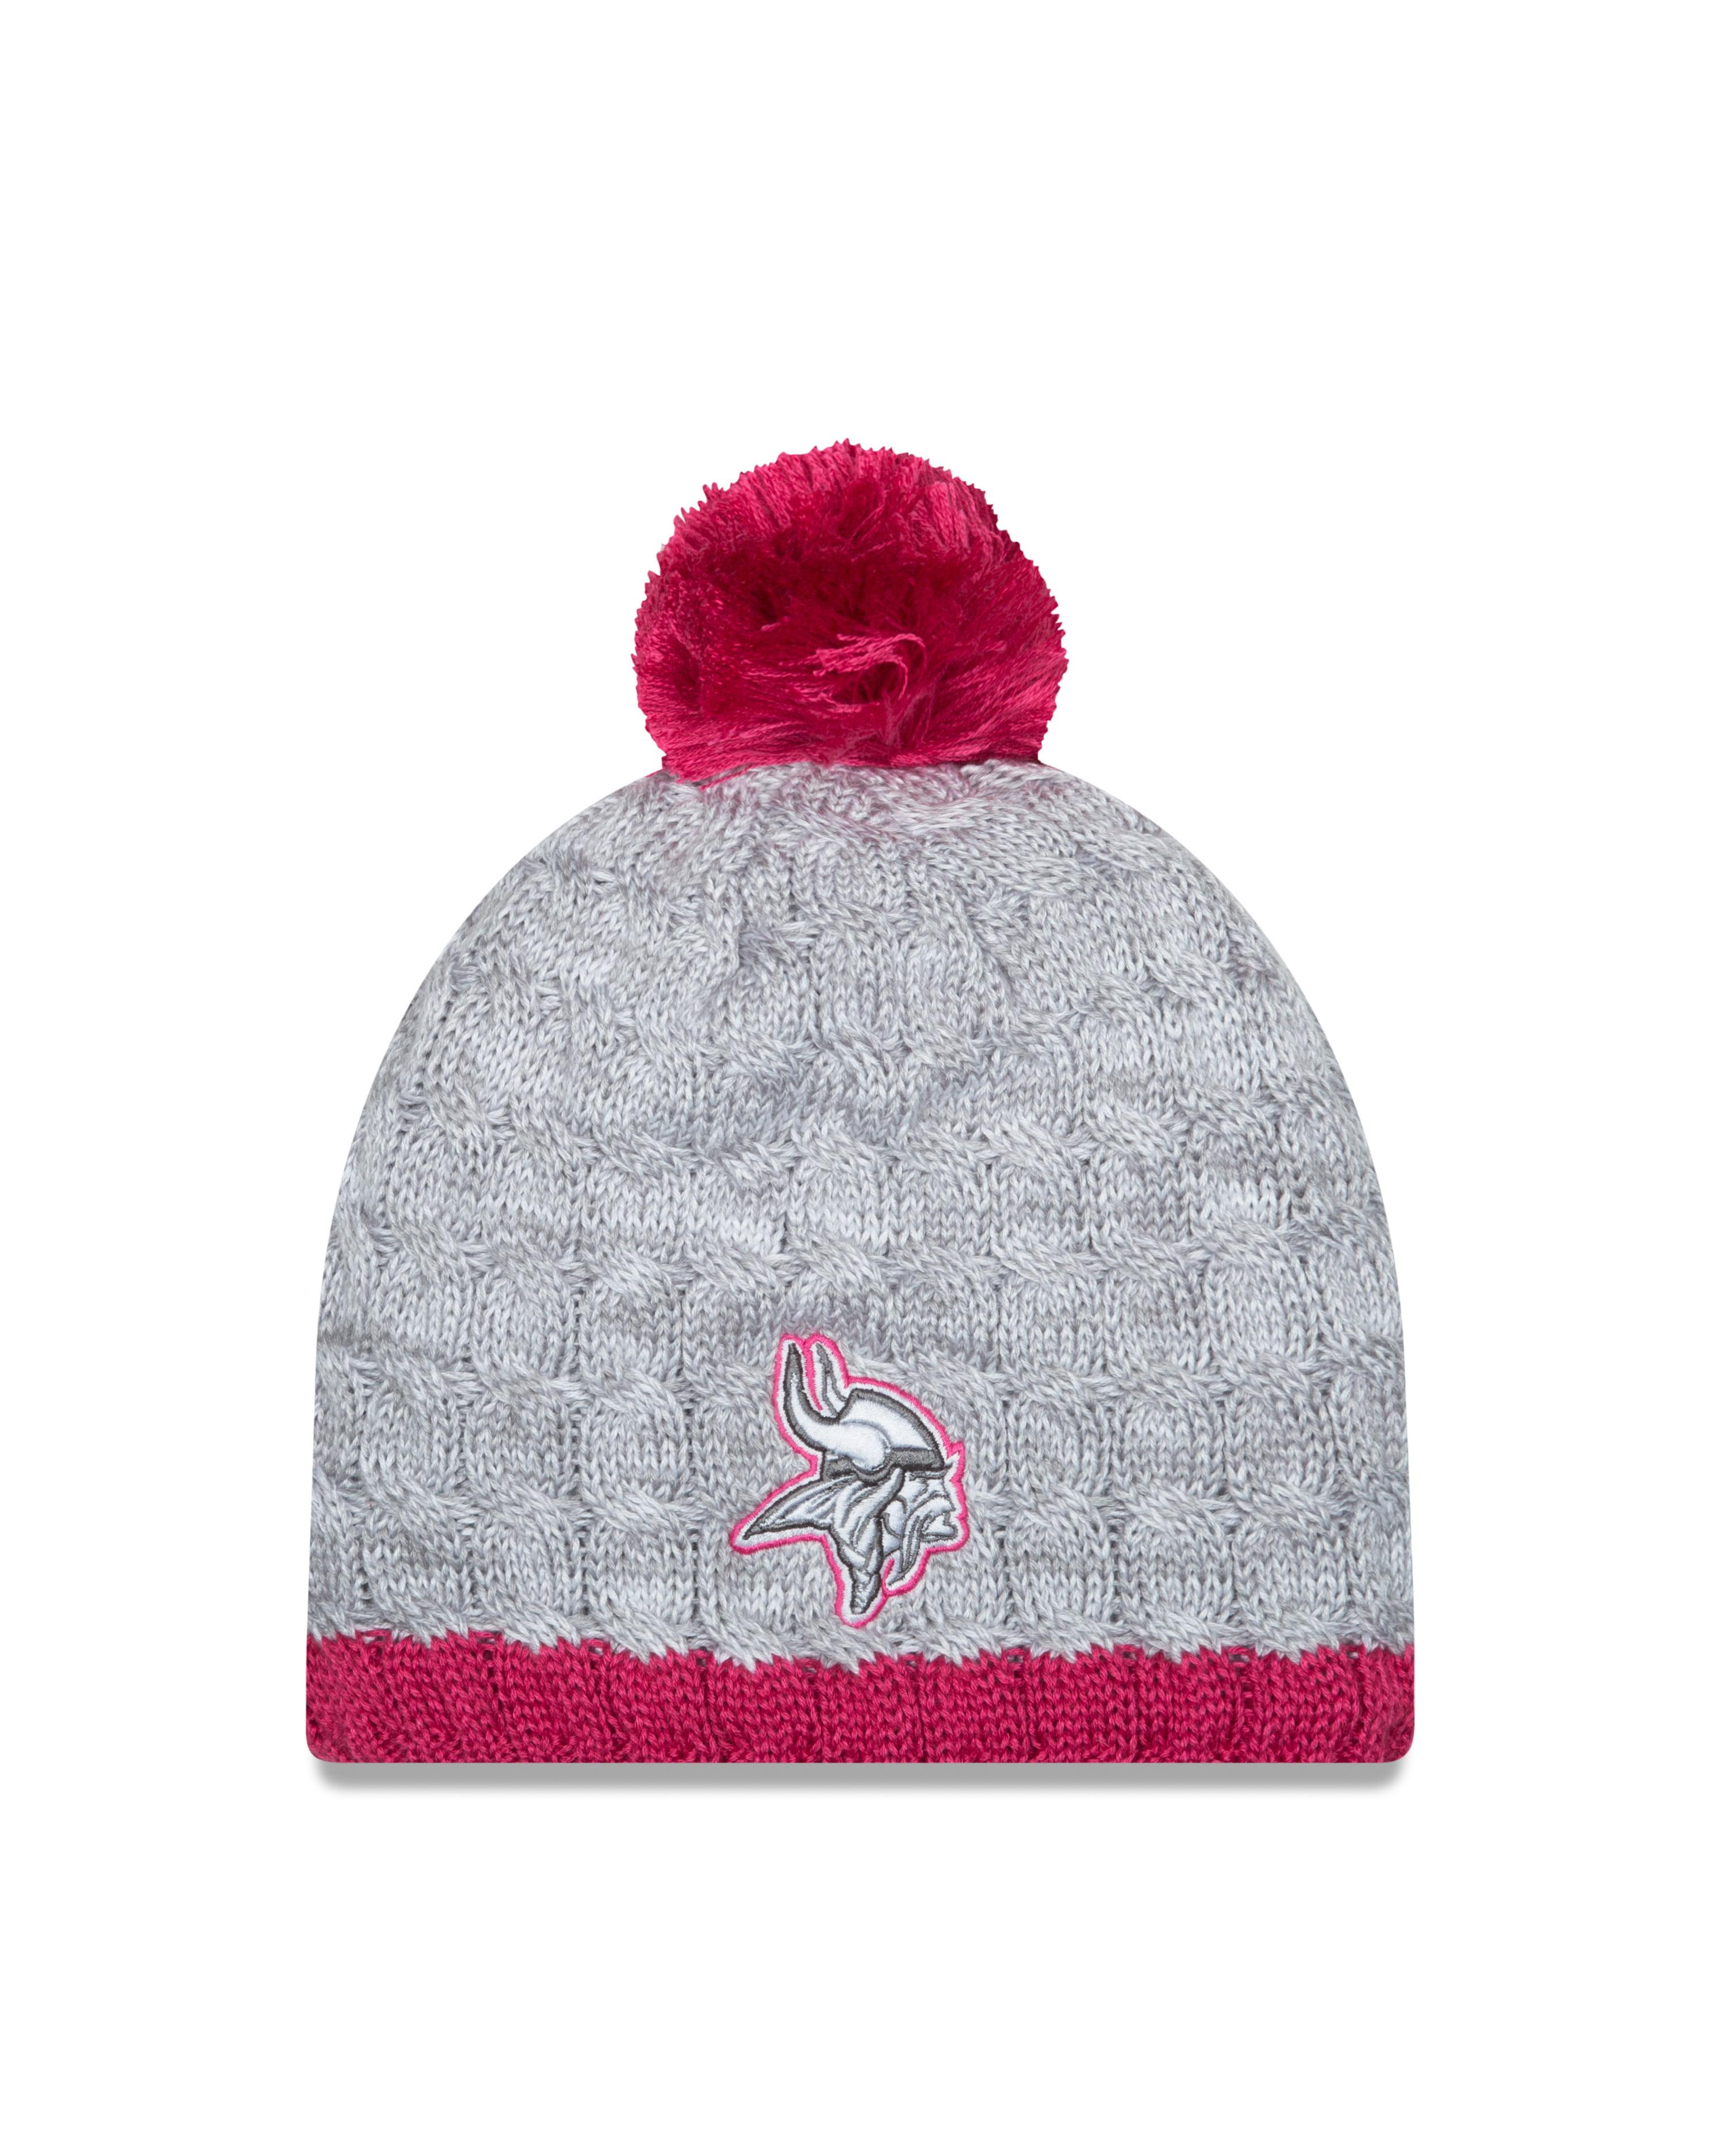 Minnesota Vikings 2015 BCA Women's Knit Hat with Pom by New Era